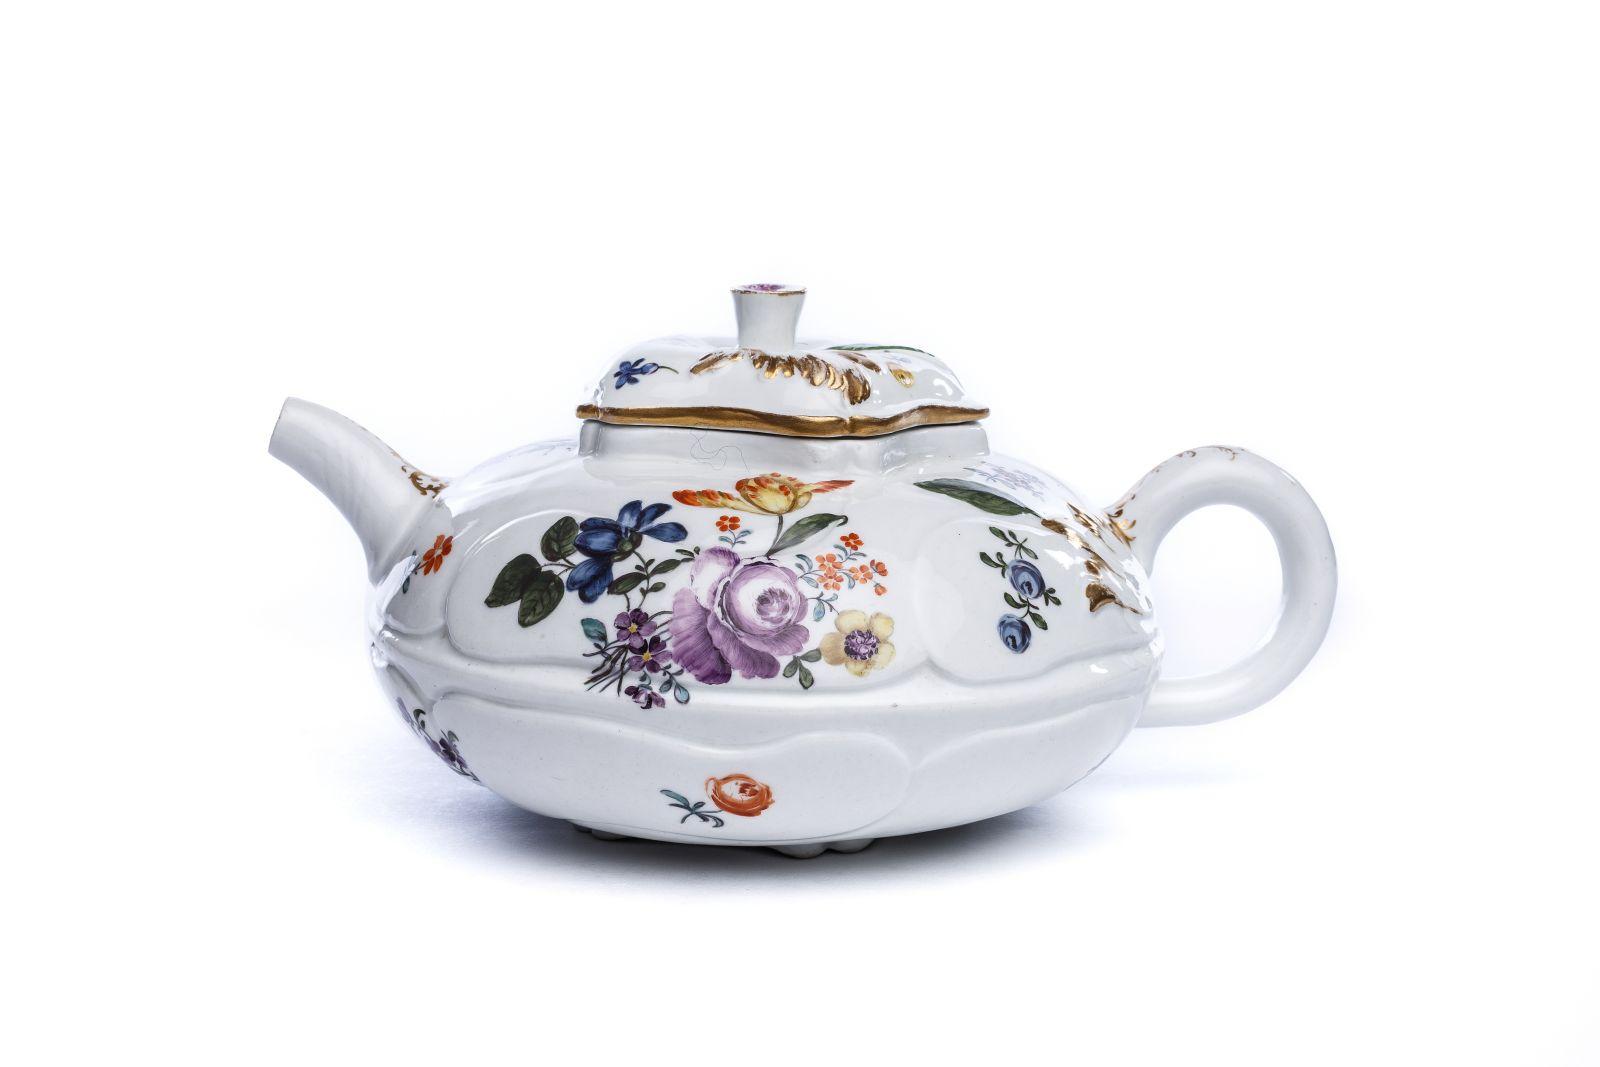 "#36 Rare large tea pot ""Flower painting"" Meissen 1740 | Seltene große Teekanne ""Blumenmalerei"" Meissen 1740 Image"